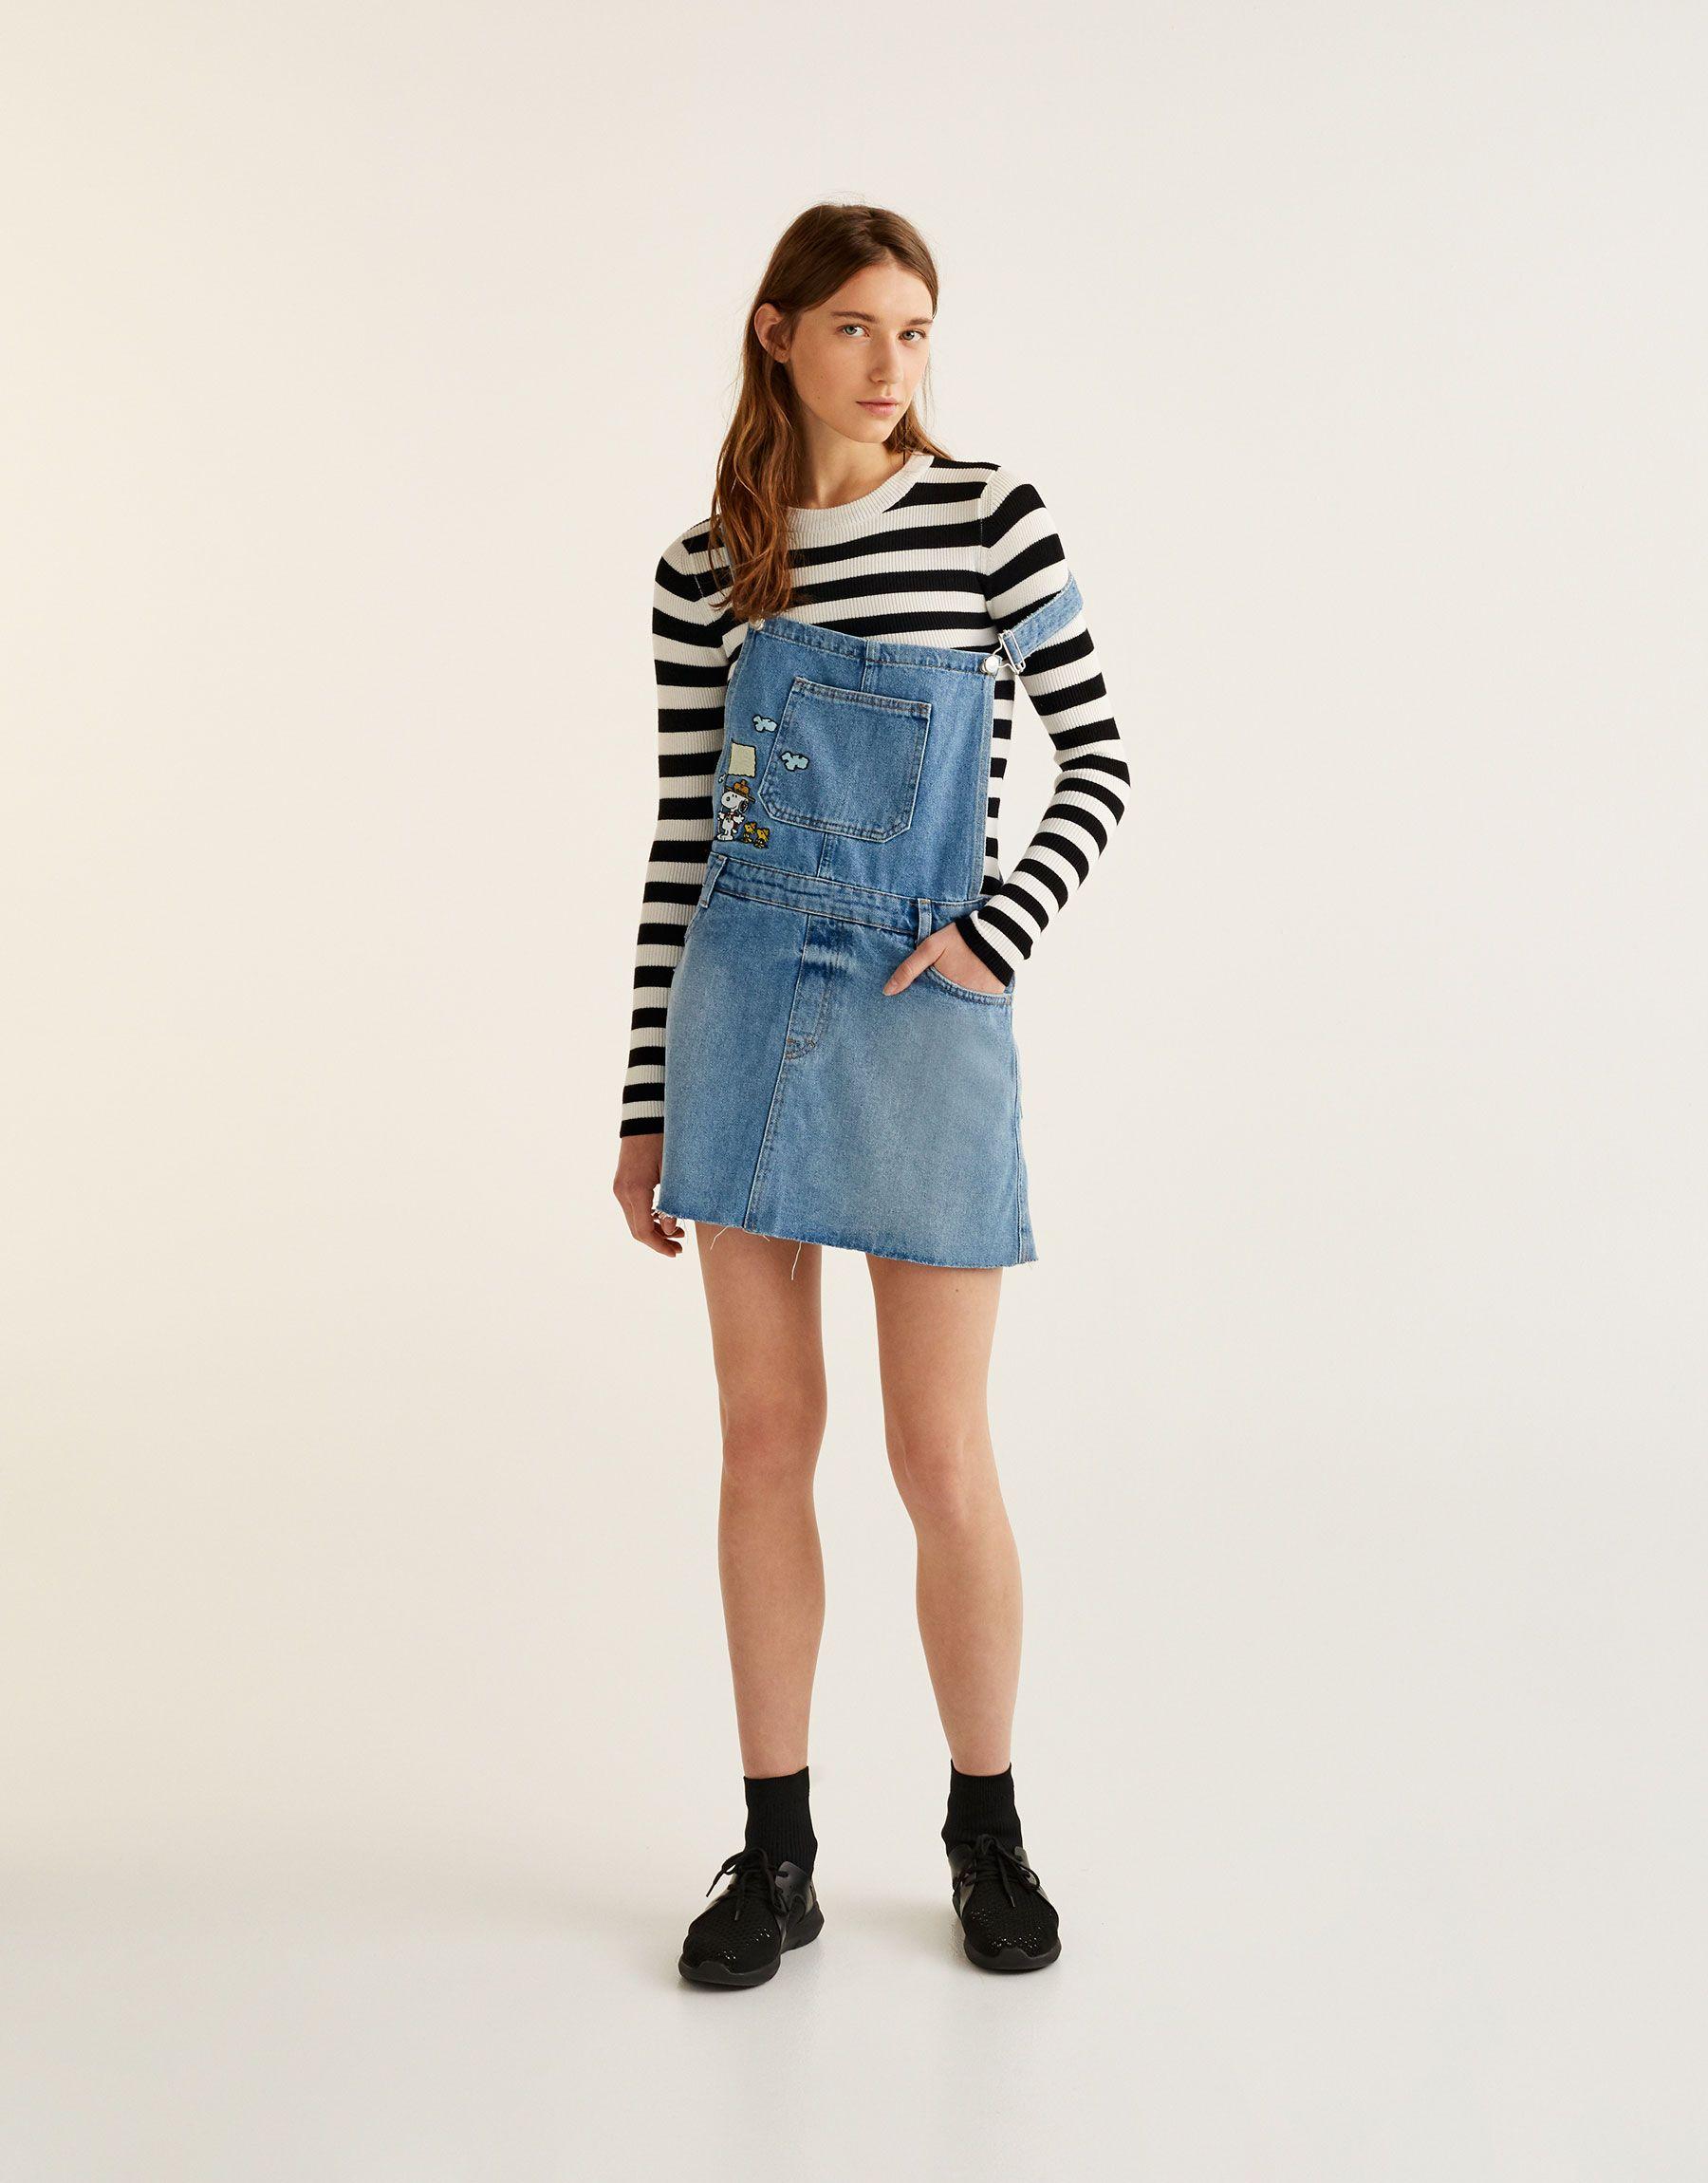 Pinafore Pull Clothing Amp;bear Woman Dresses Dress Denim Snoopy fgvYy76b